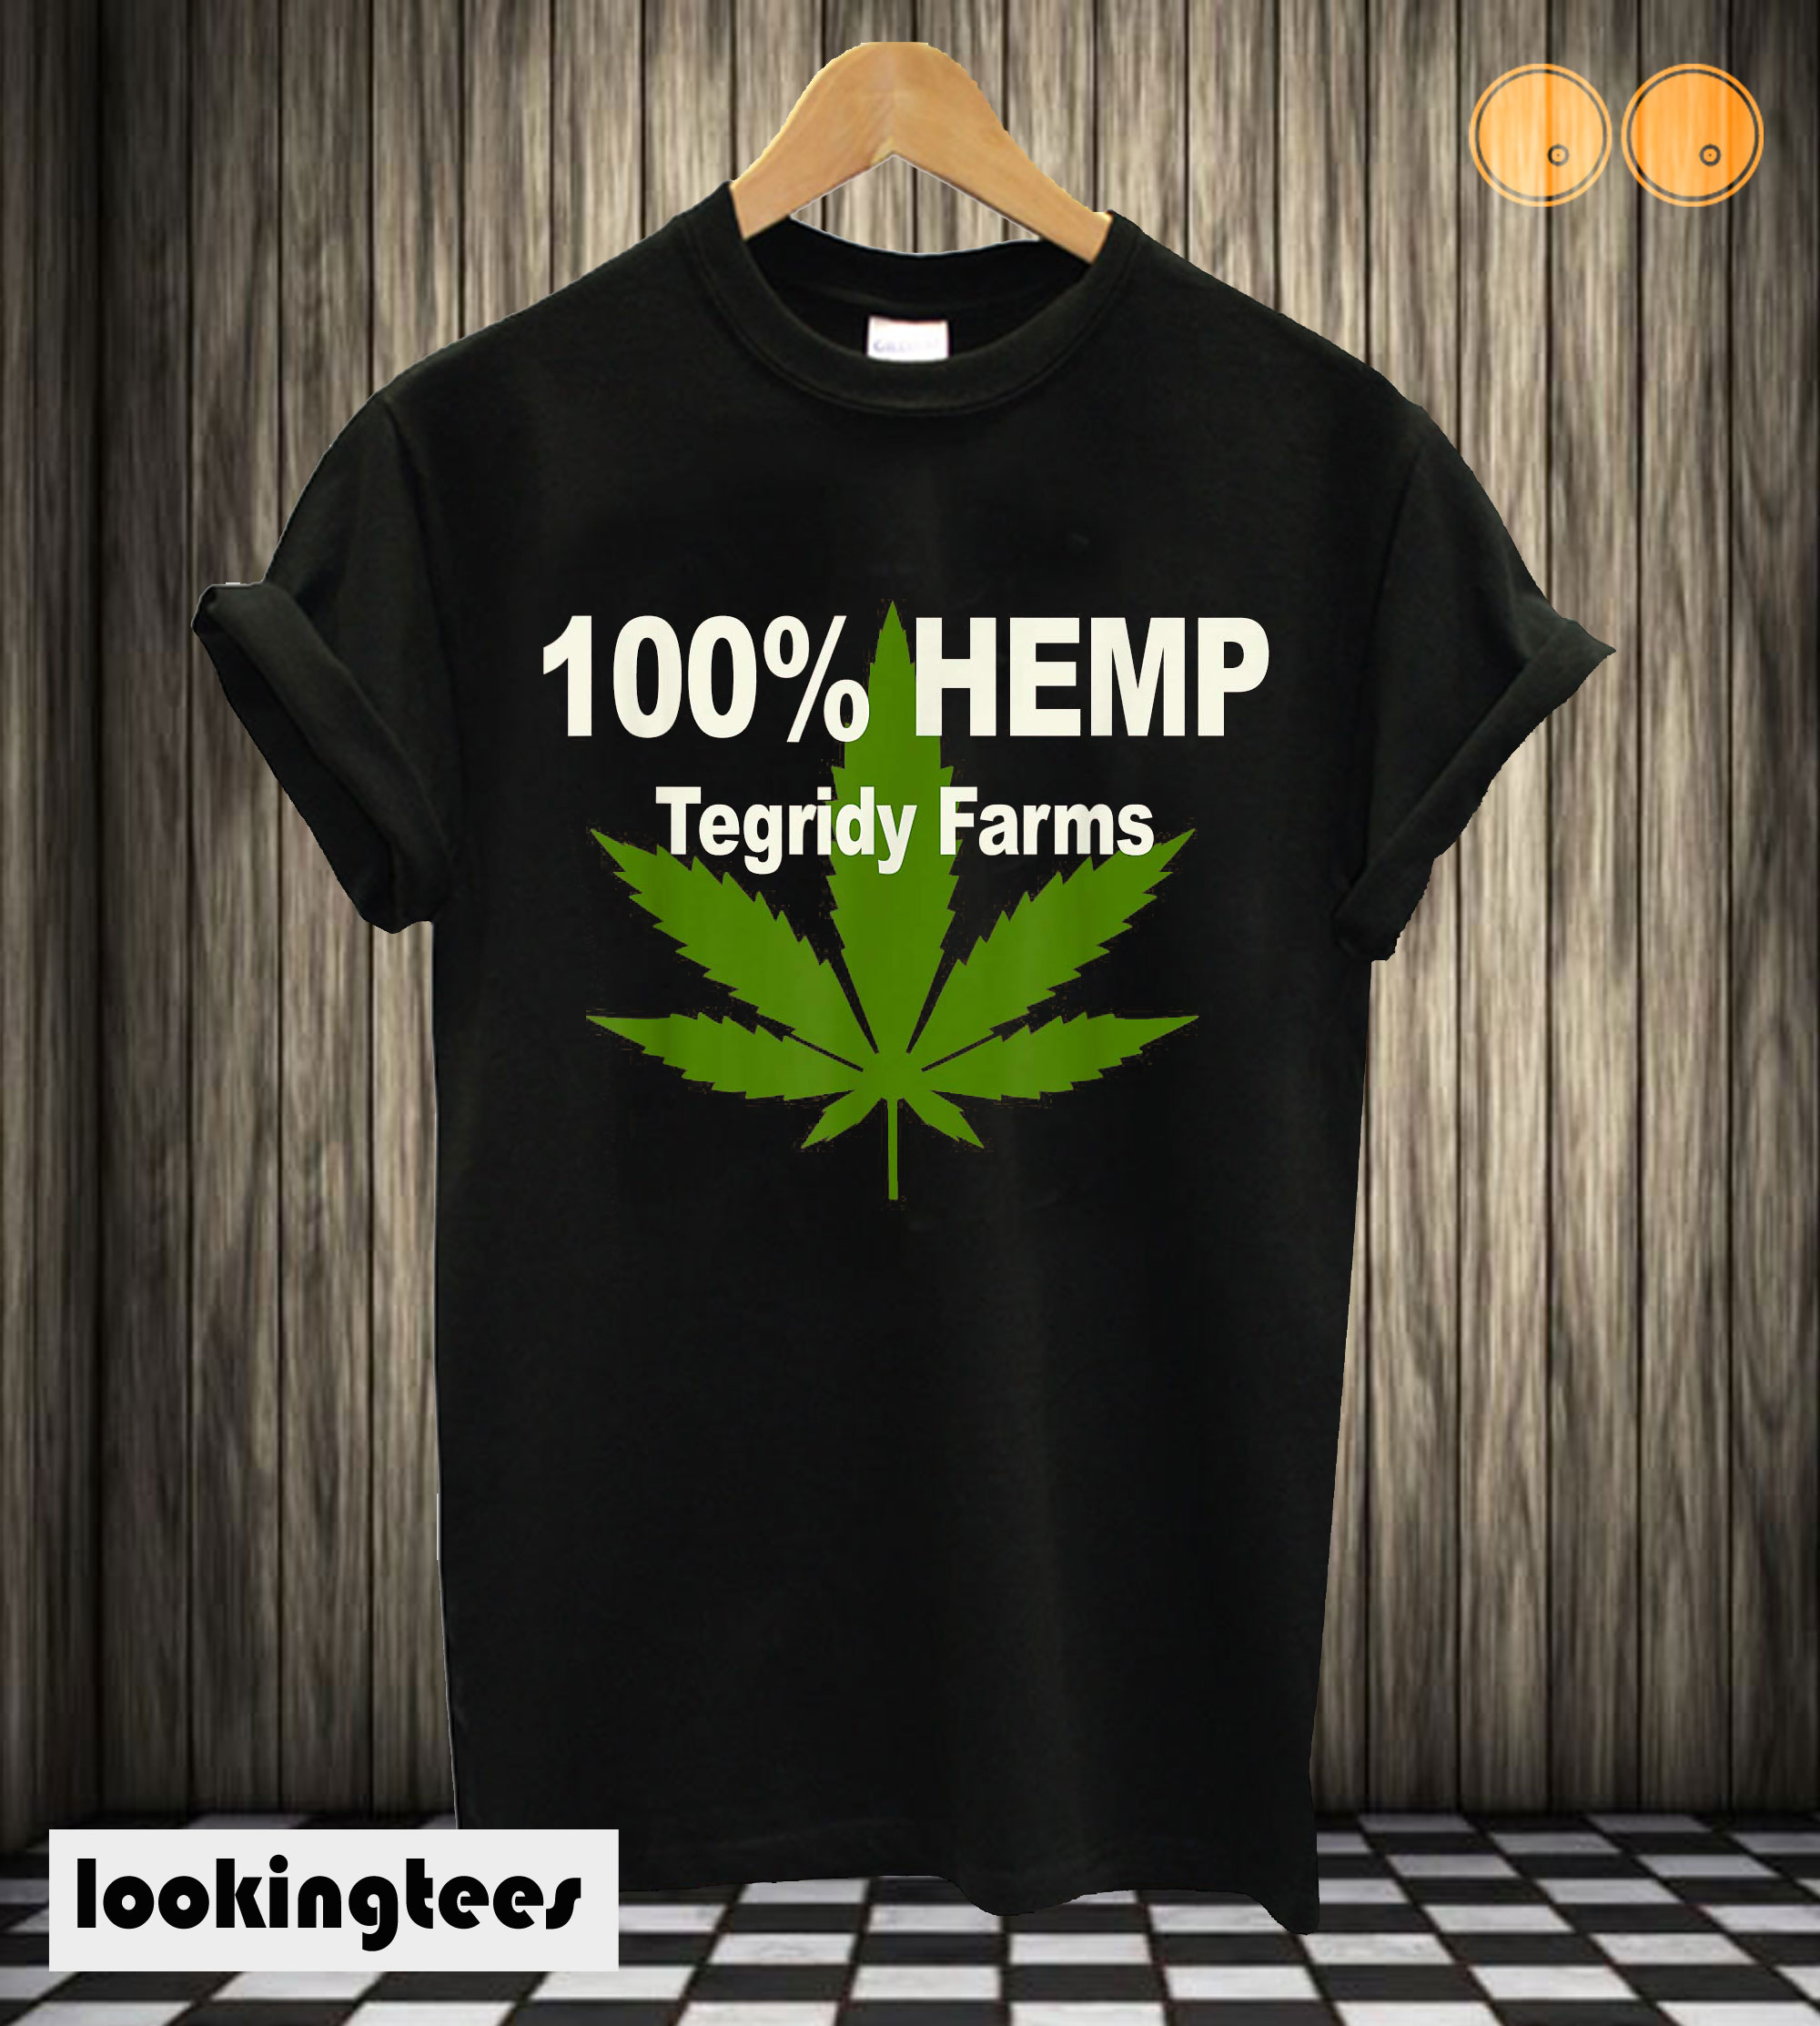 100% Hemp Tegridy Farms T shirt